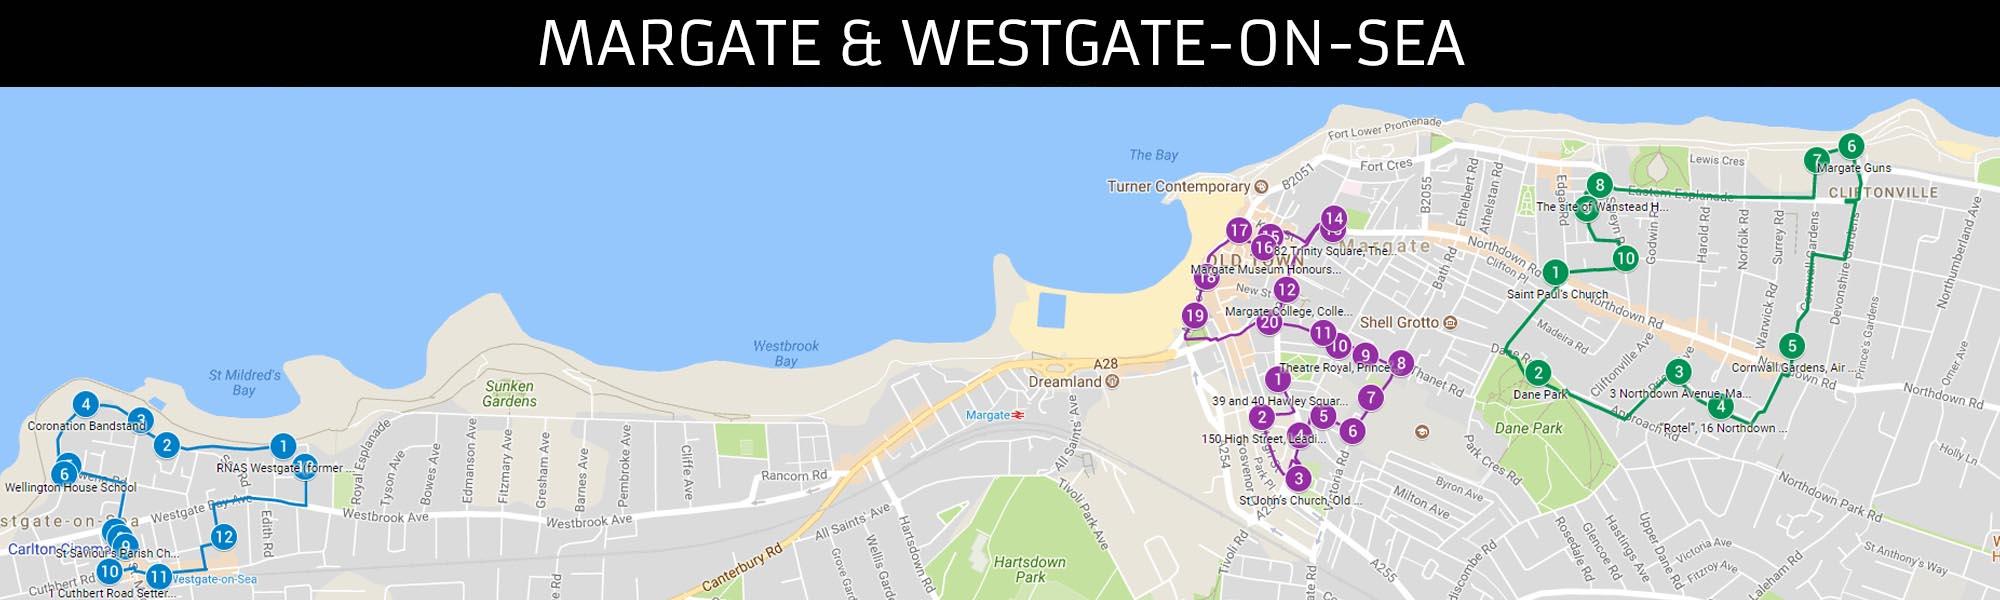 Margate & Westgate-on-Sea Trails